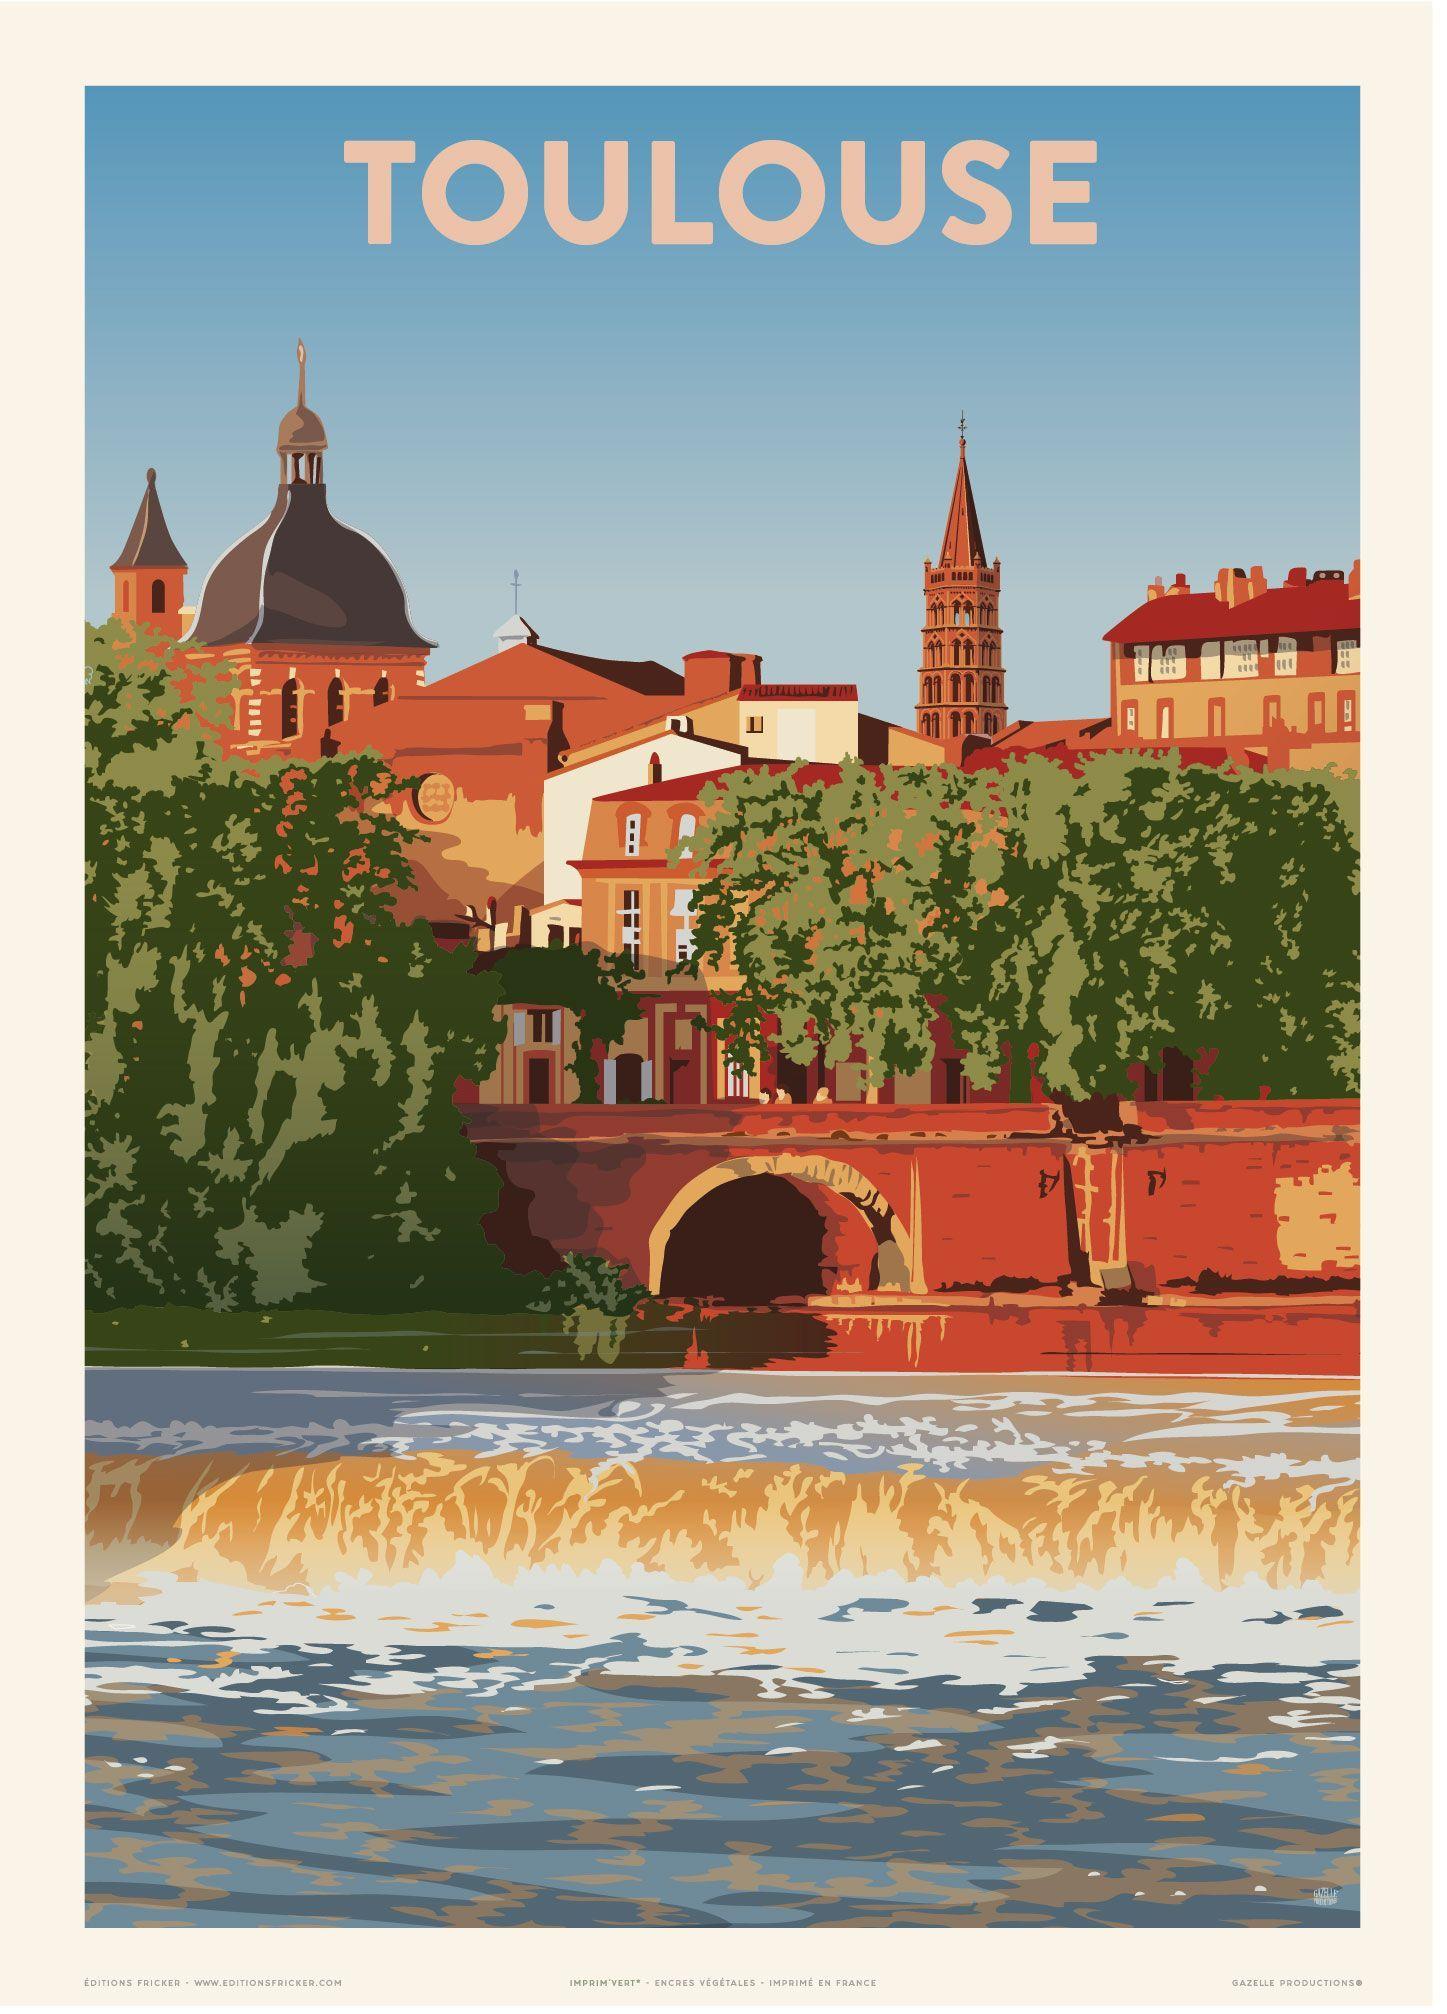 Toulouse St Sernin Travel Poster Vintage Poster Gazelle